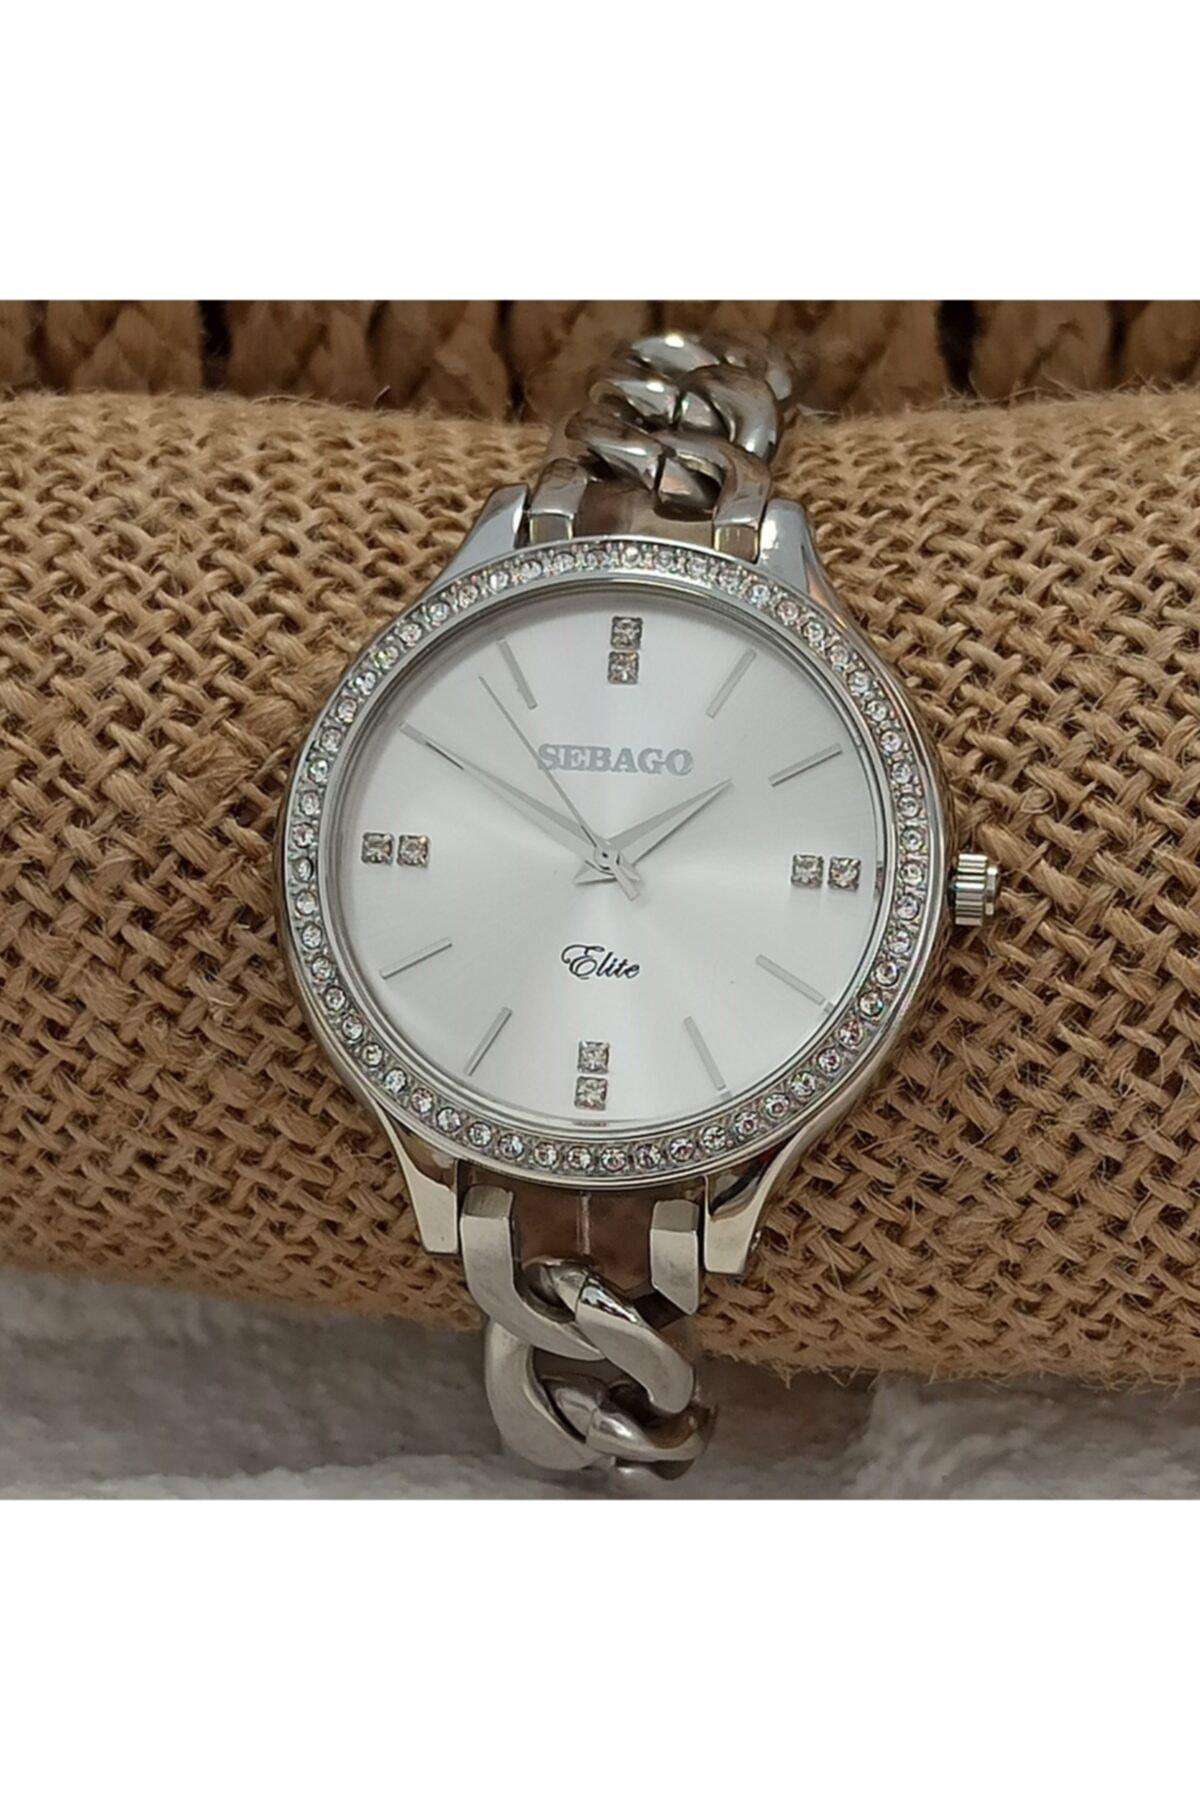 Sebago Sbgs01132p-6 Kadın Kol Saati 1